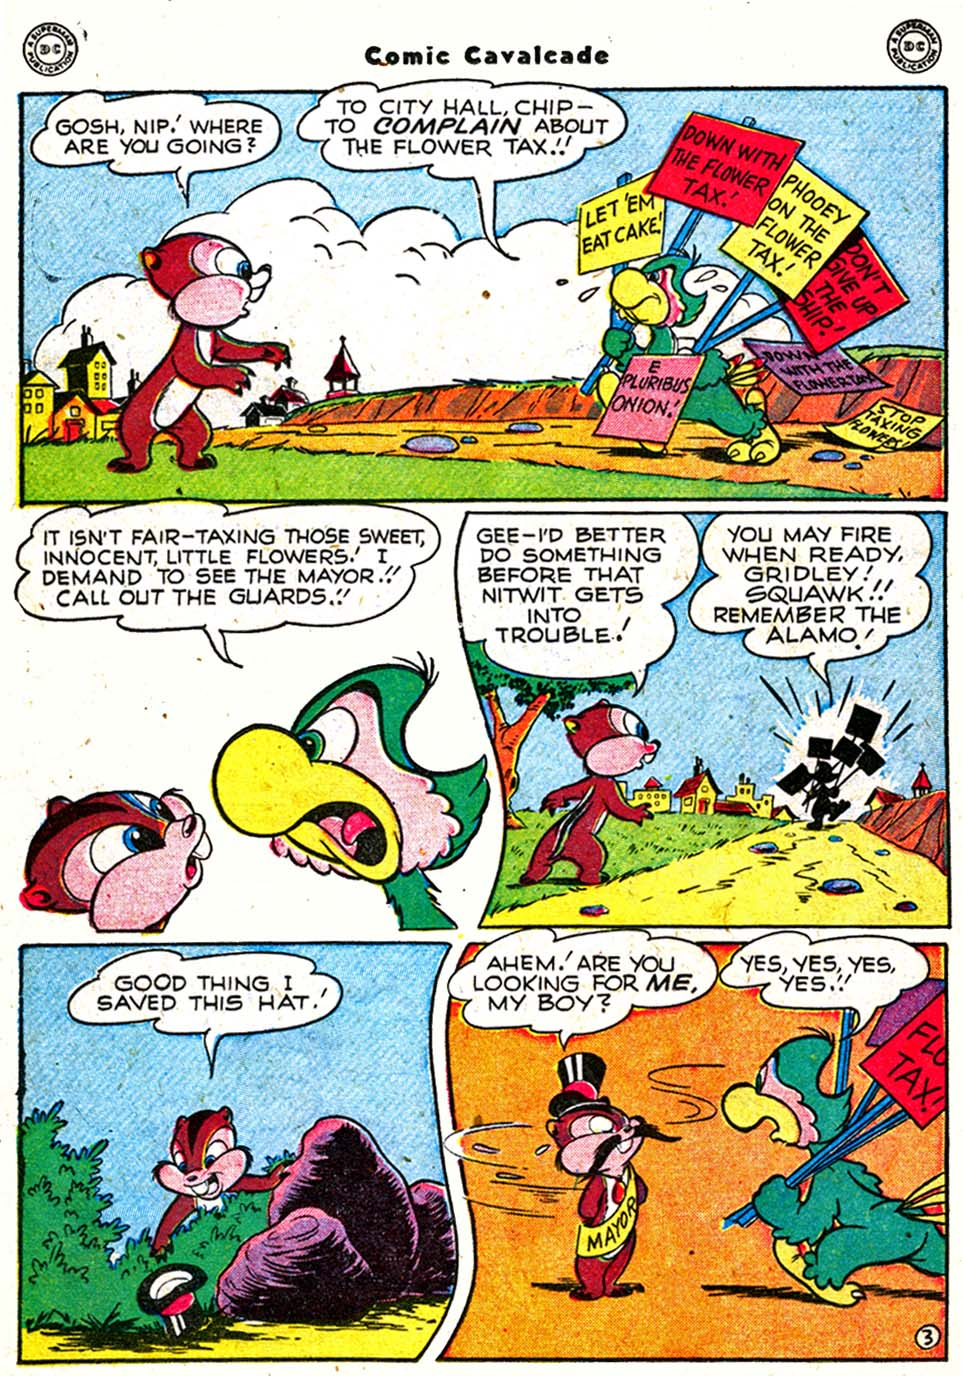 Comic Cavalcade issue 31 - Page 62